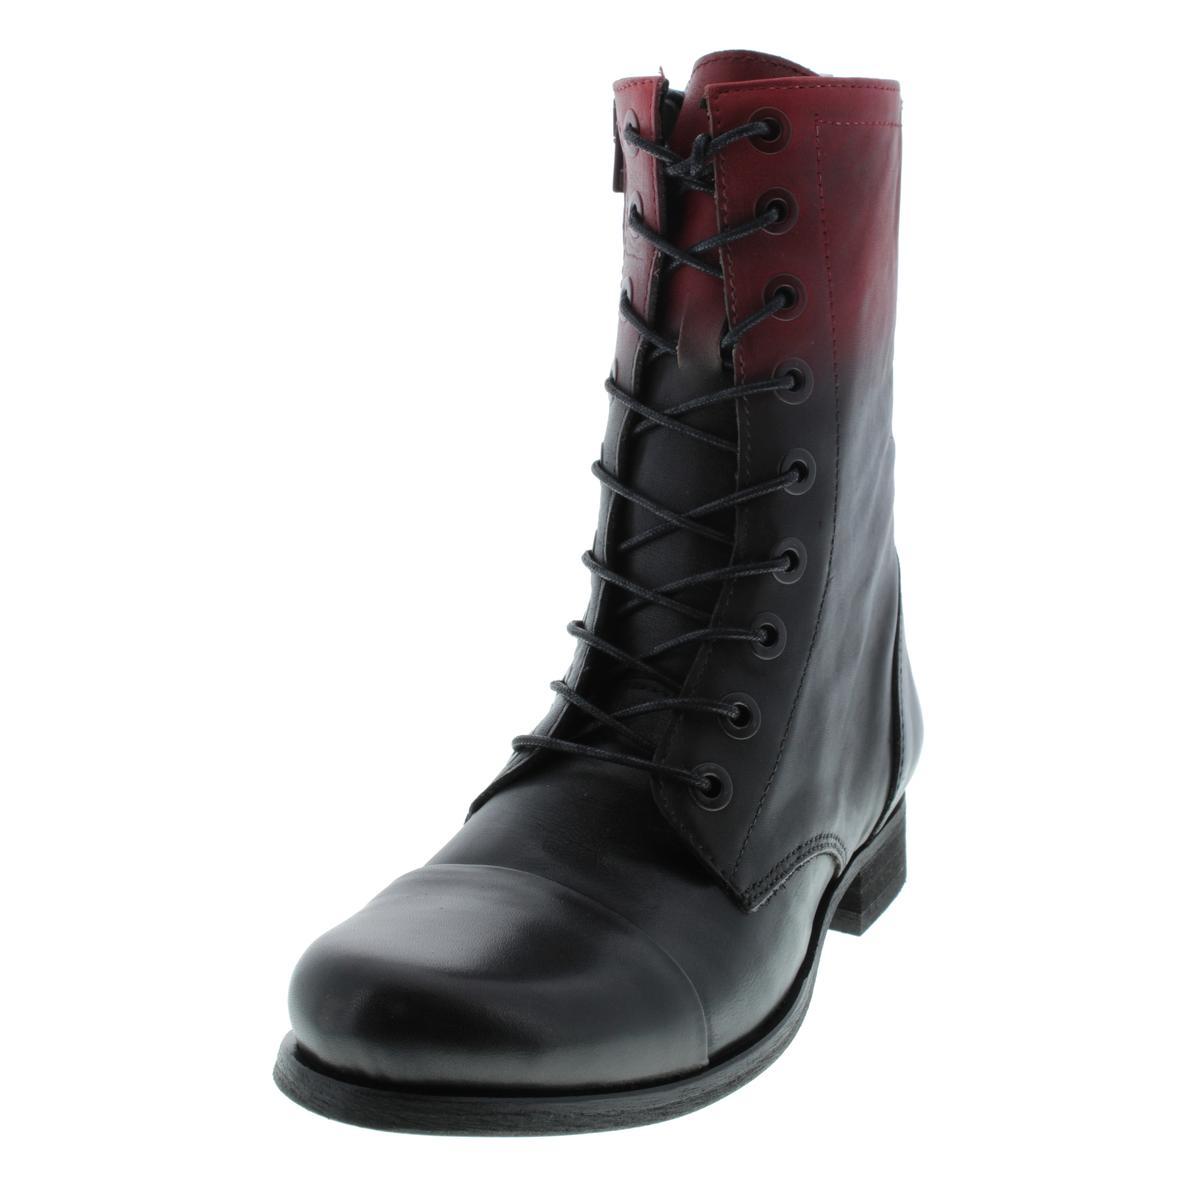 Diesel 2089 Womens The Wild Land Arthik Leather Combat ...